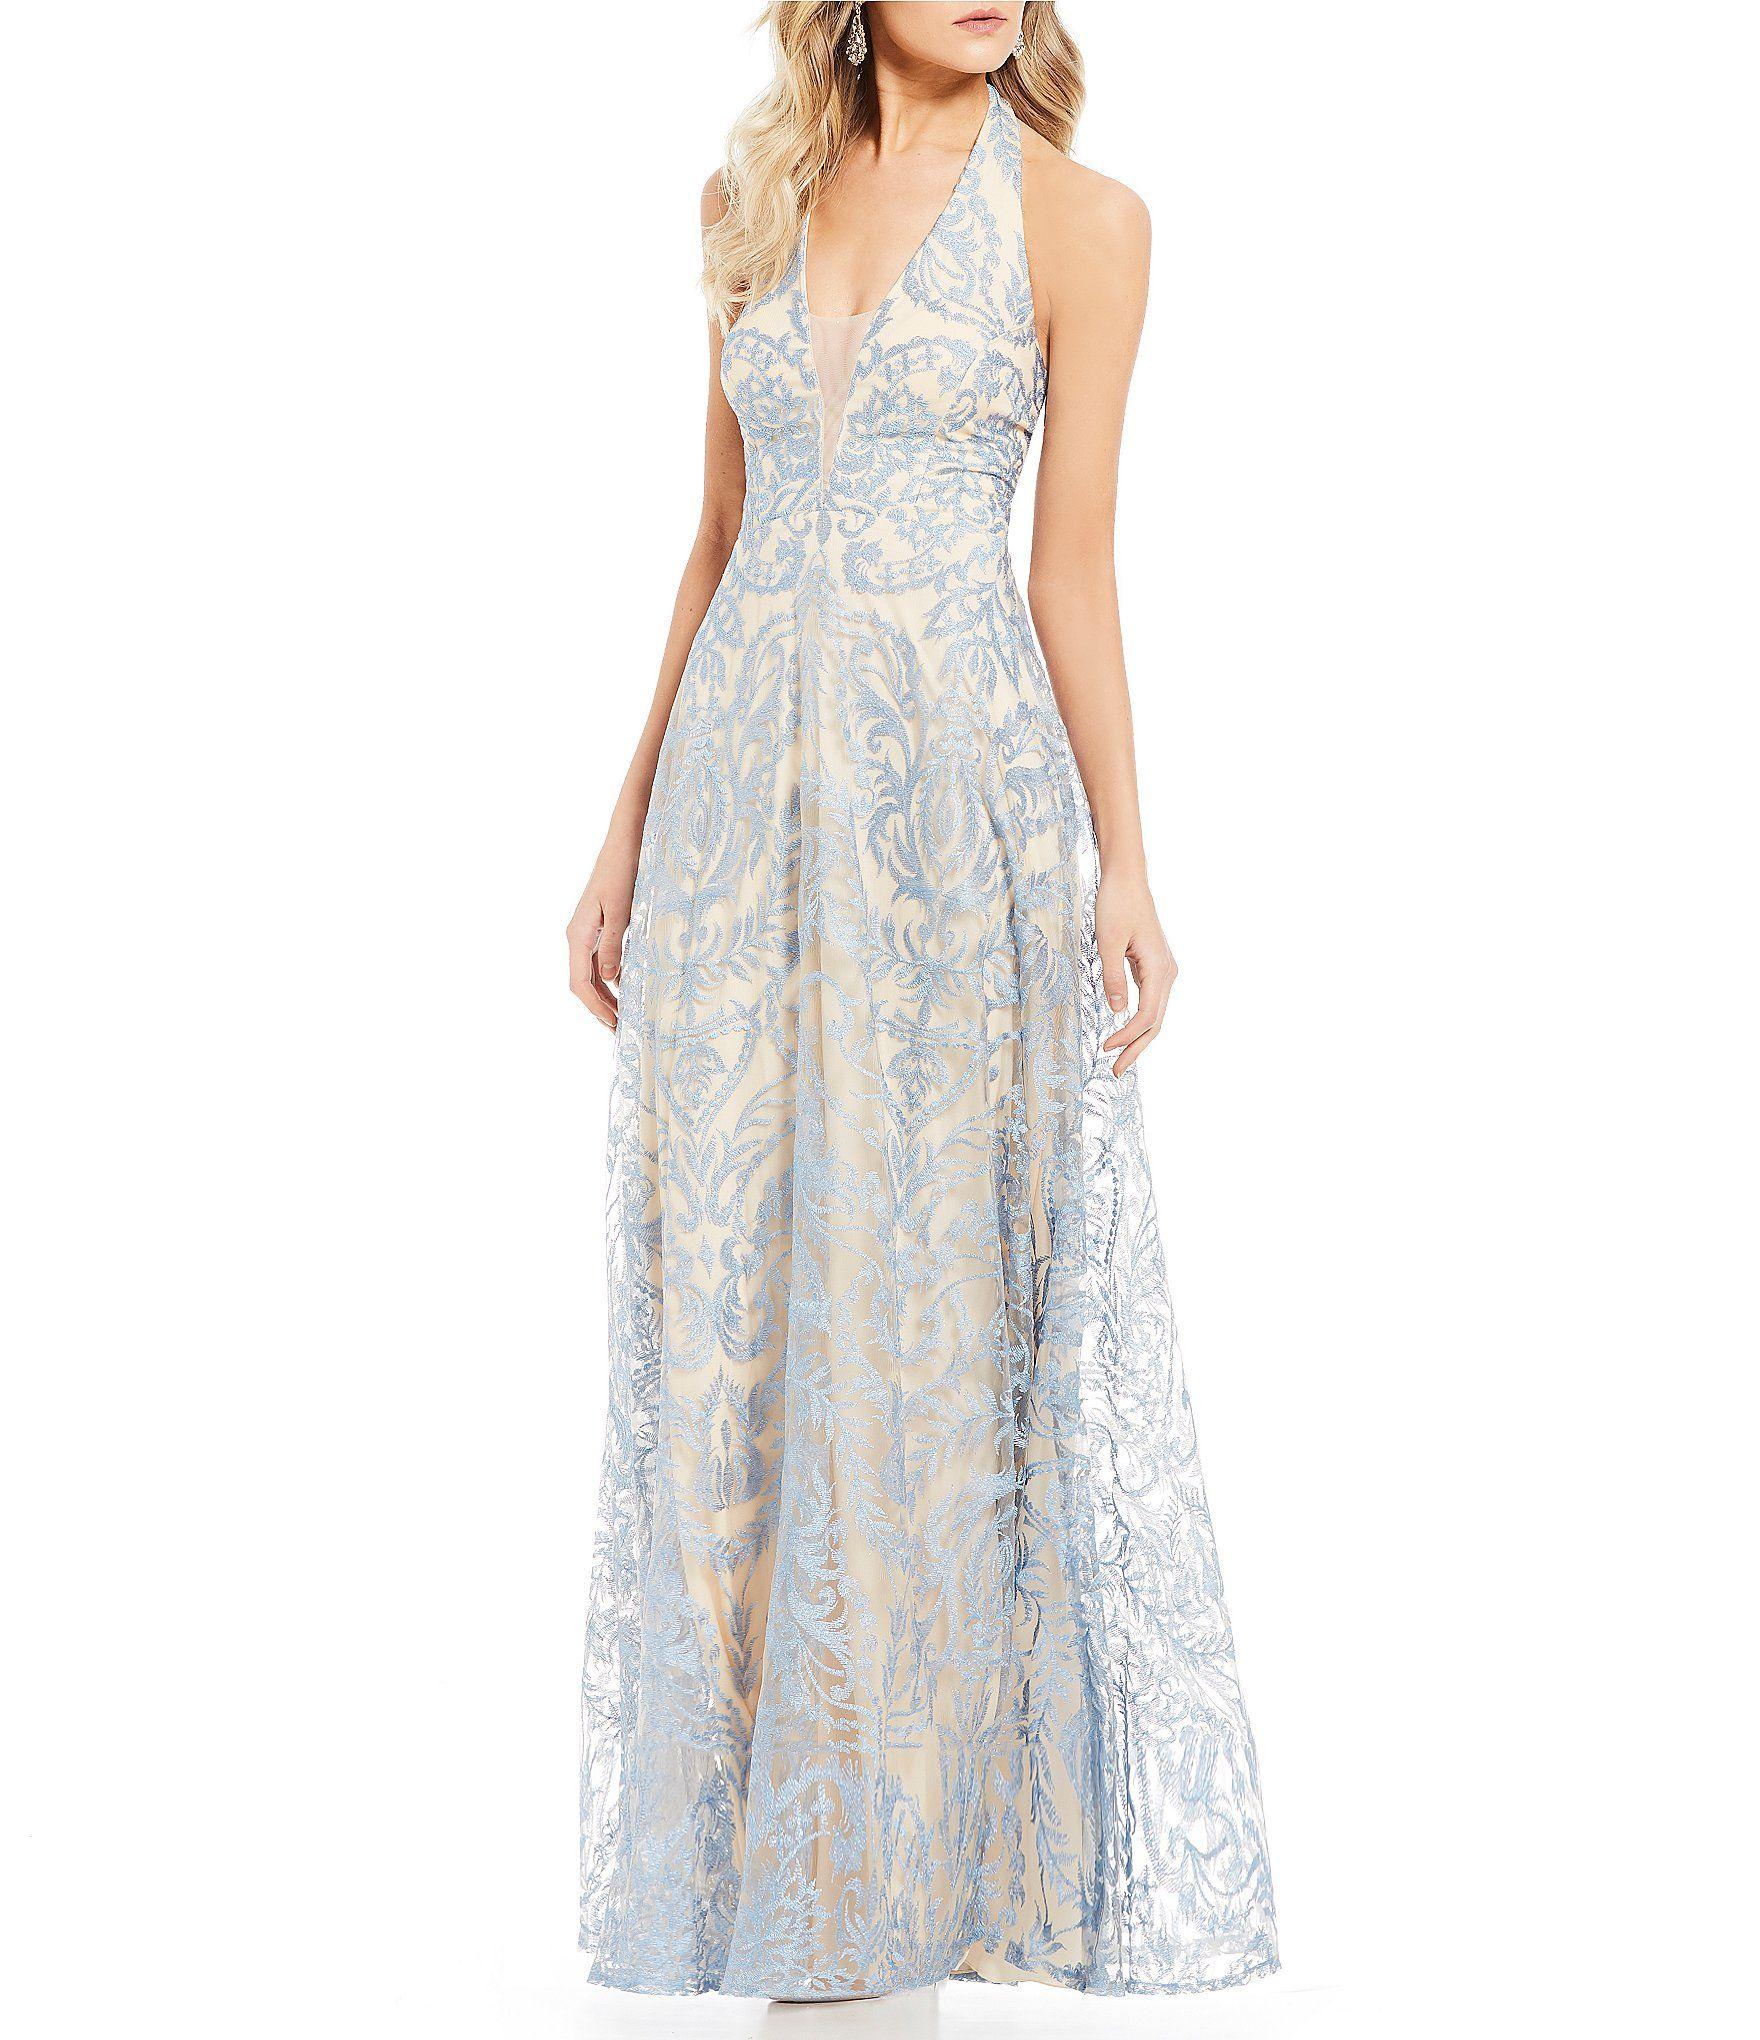 Xtraordinary halterneck embroidered long dress dillards halter